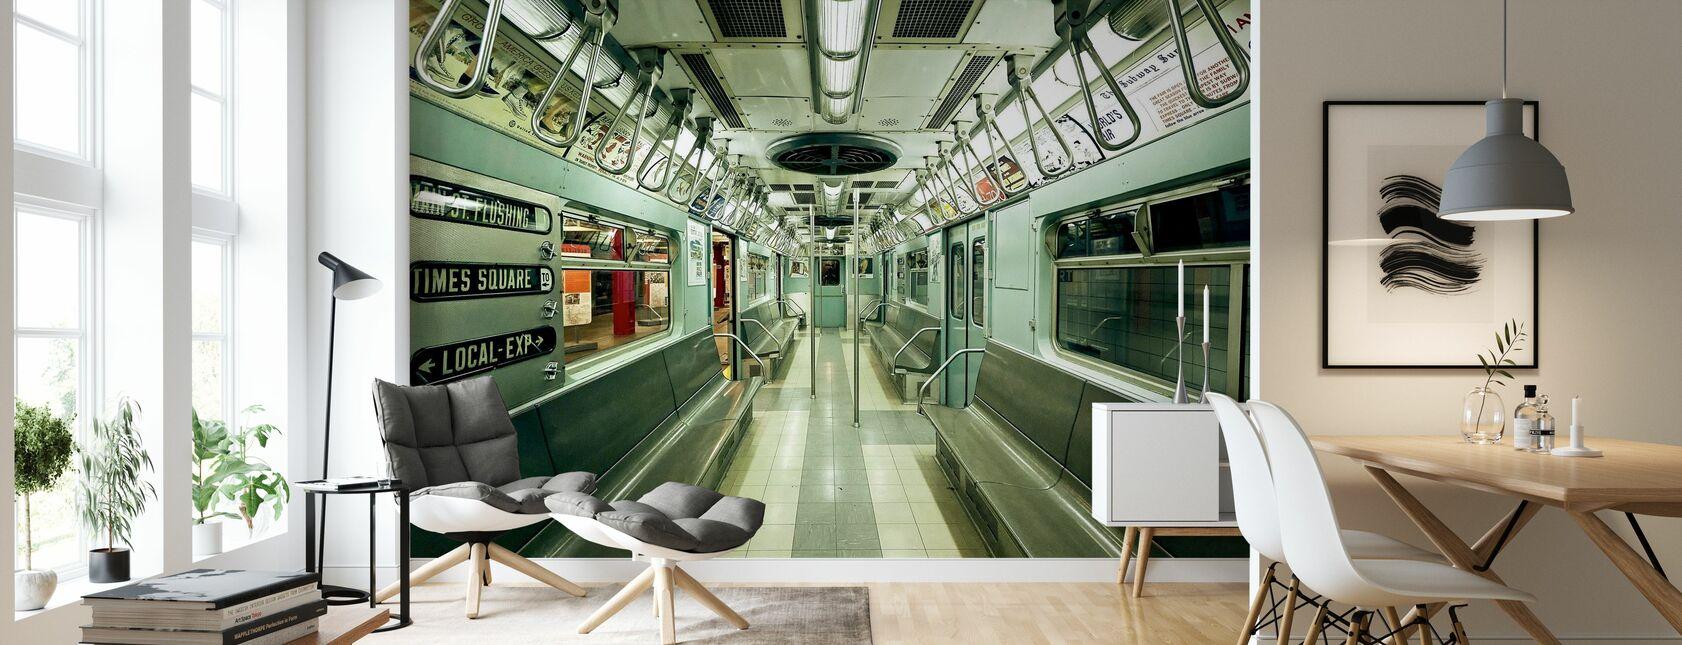 NYC Subway - Wallpaper - Living Room